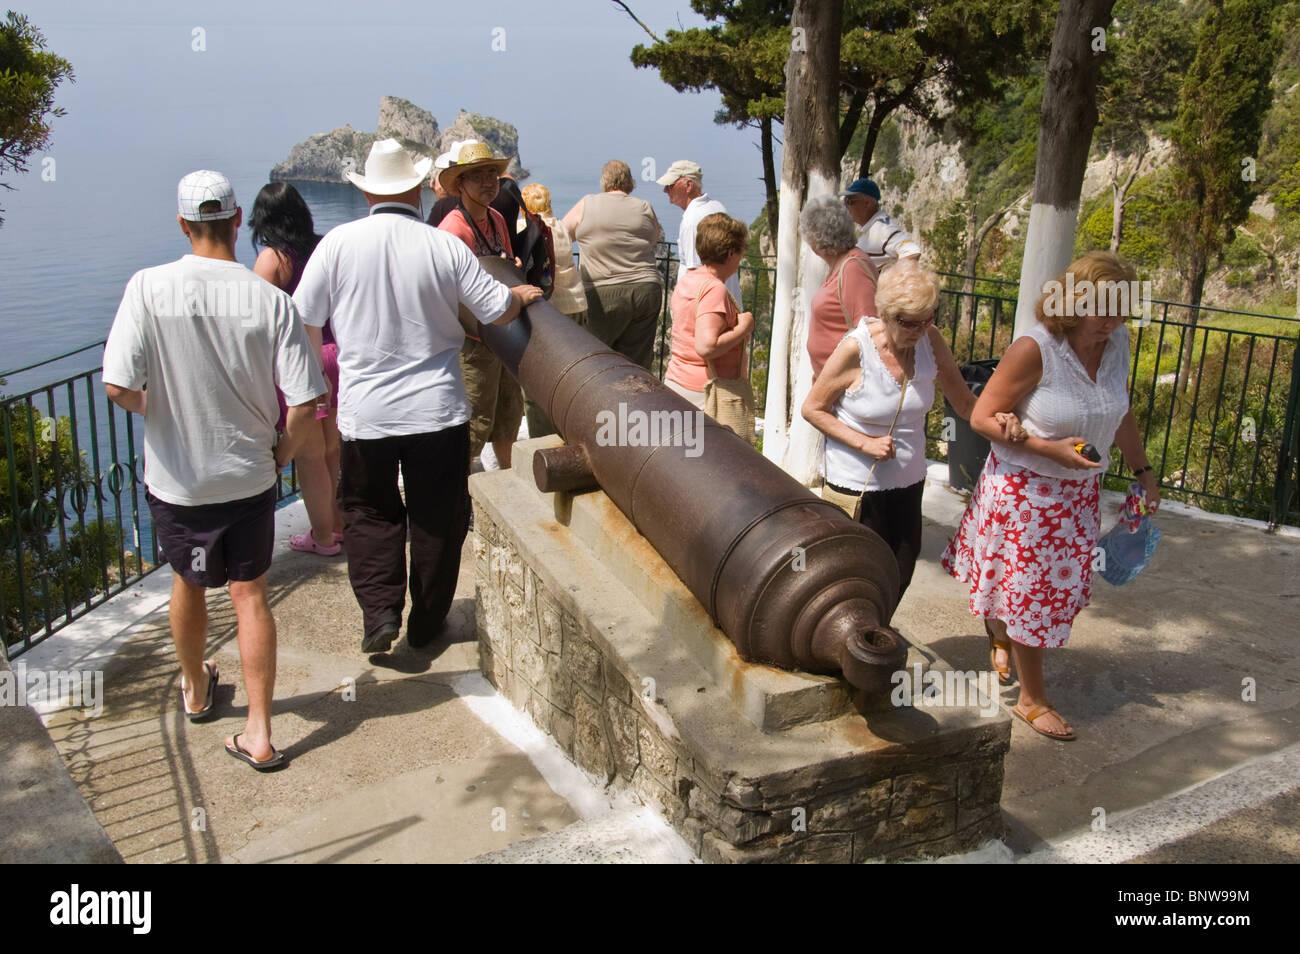 Tourists around the Russian cannon on viewpoint at Paleokastritsa on the Greek island of Corfu Greece GR - Stock Image